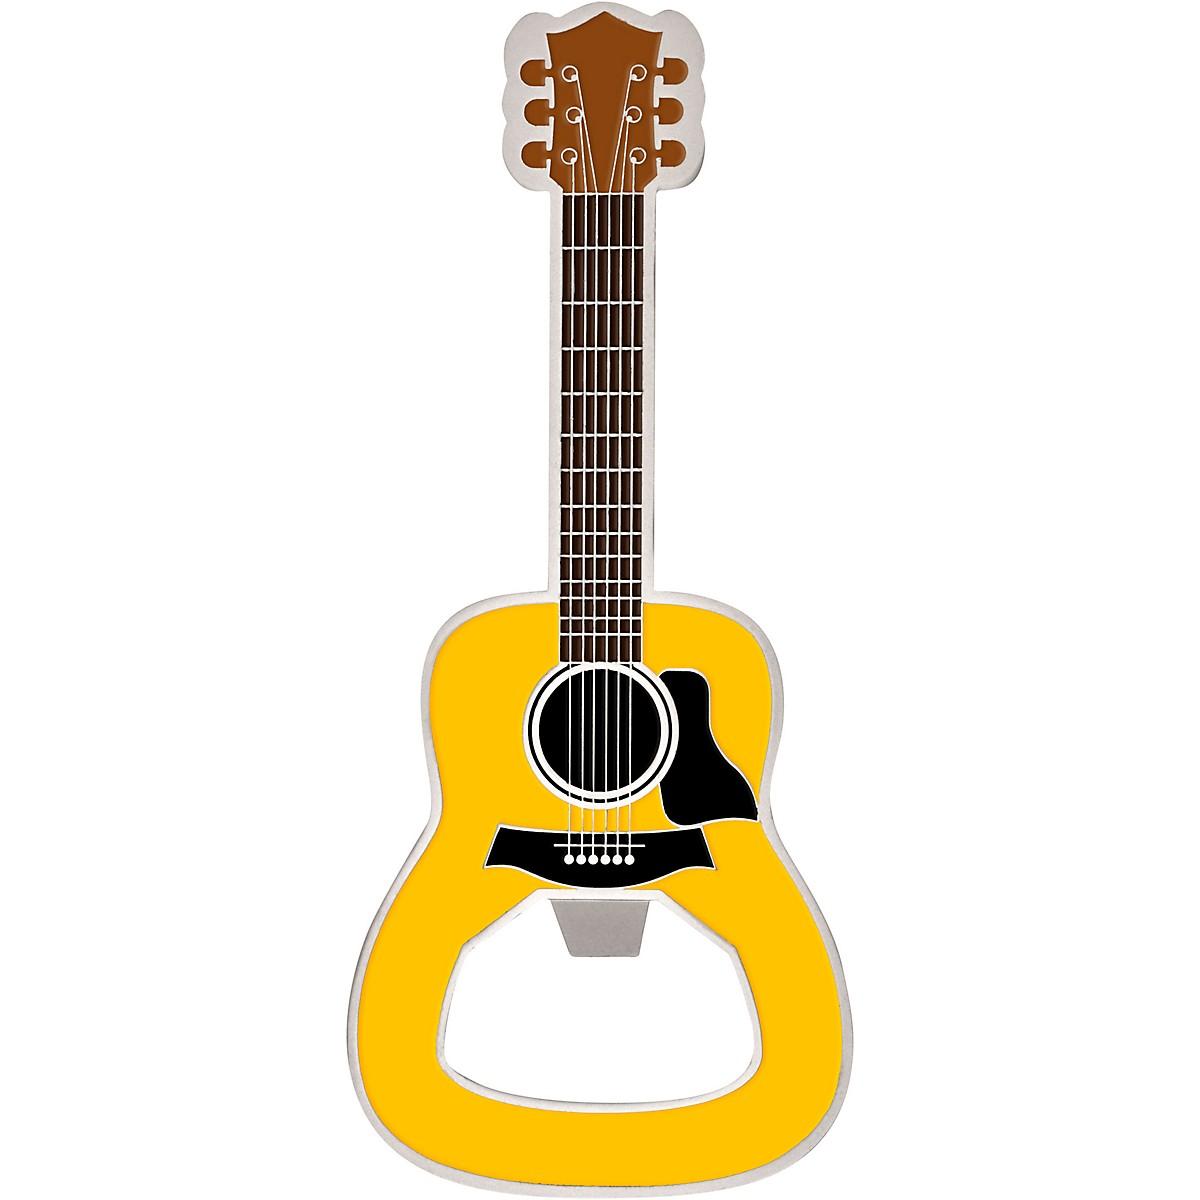 Ranger Acoustic Guitar Bottle Opener With Magnet